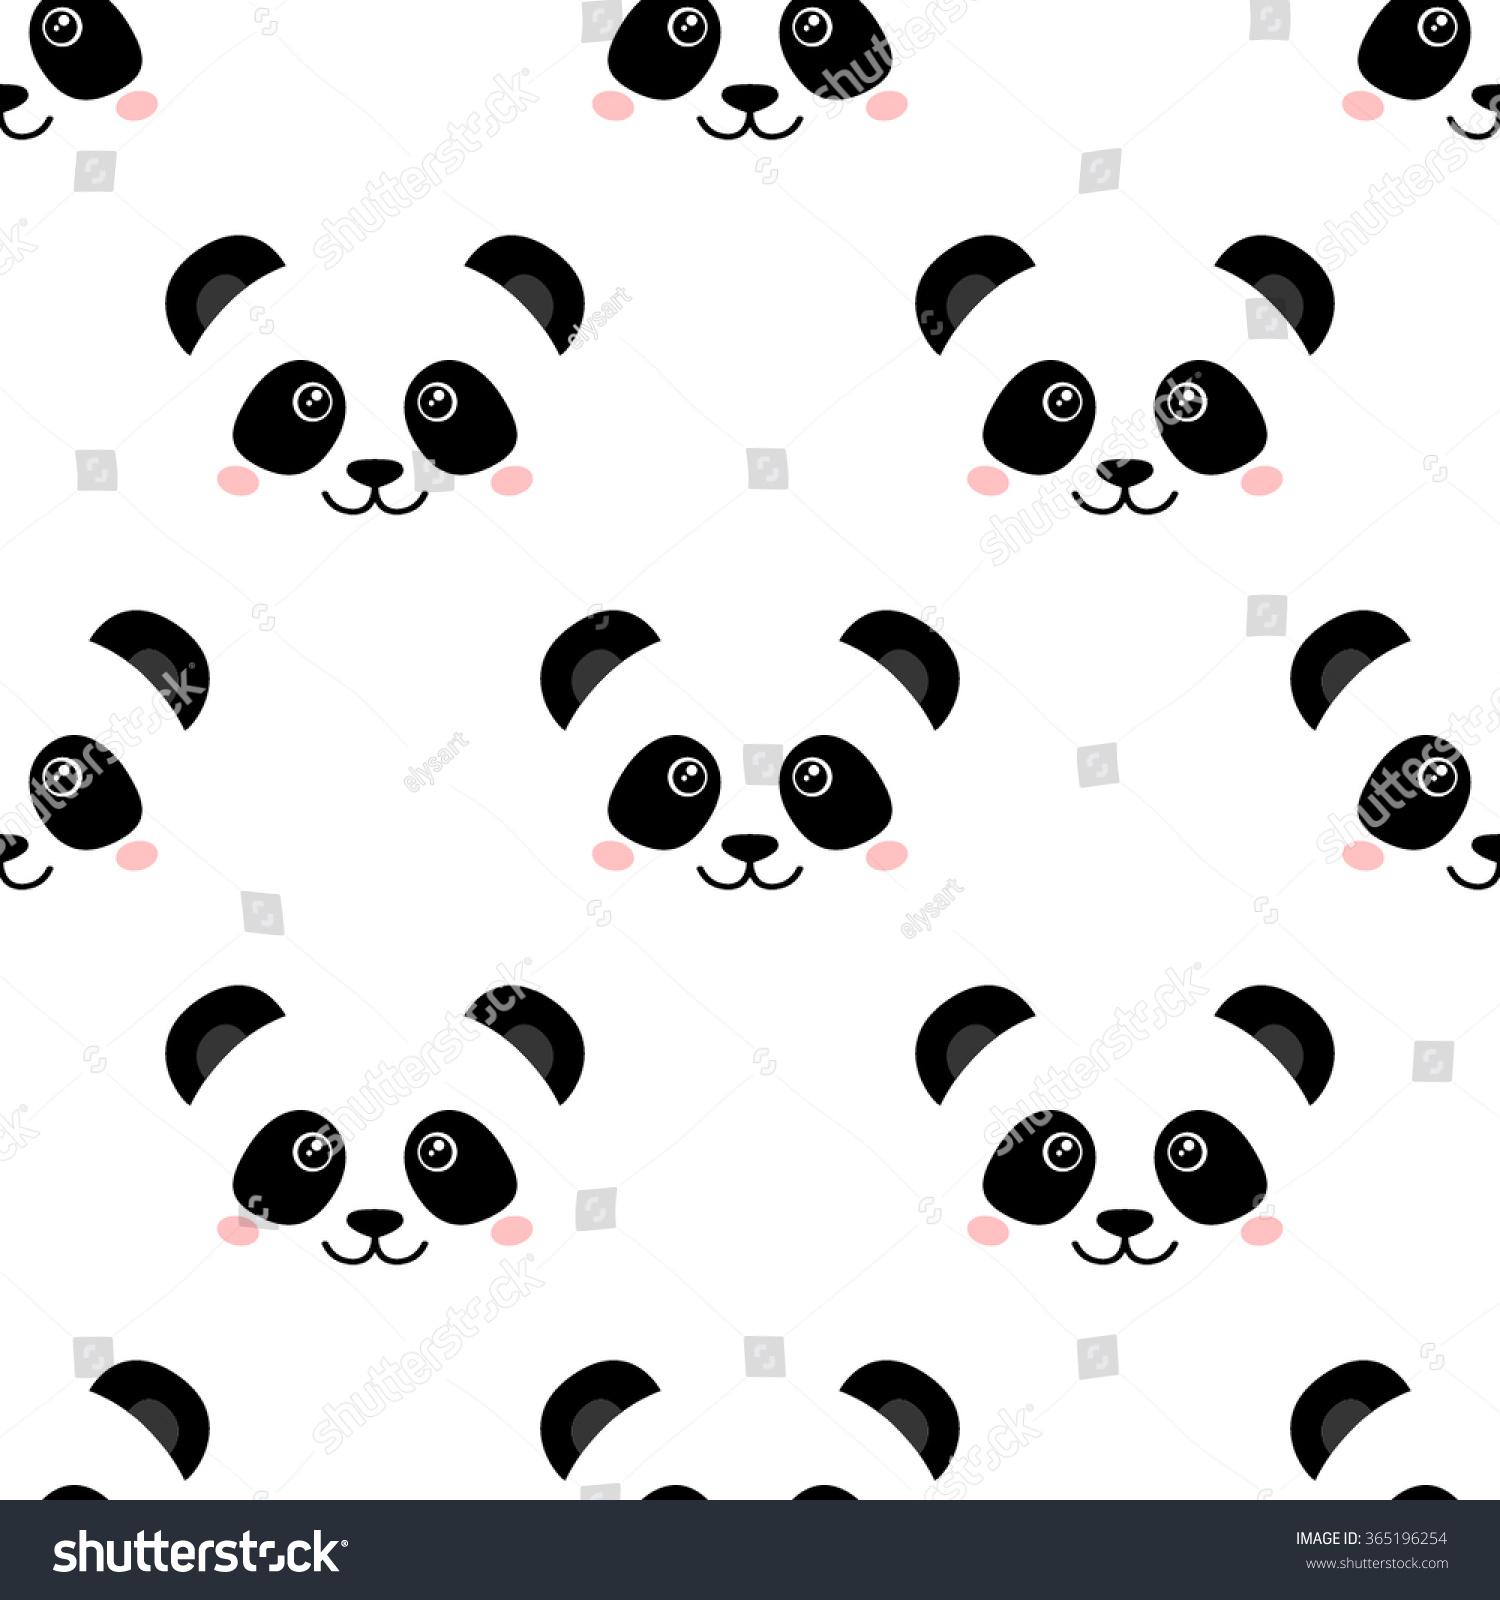 panda face drawing - Google Search | restaurant (sushi ...